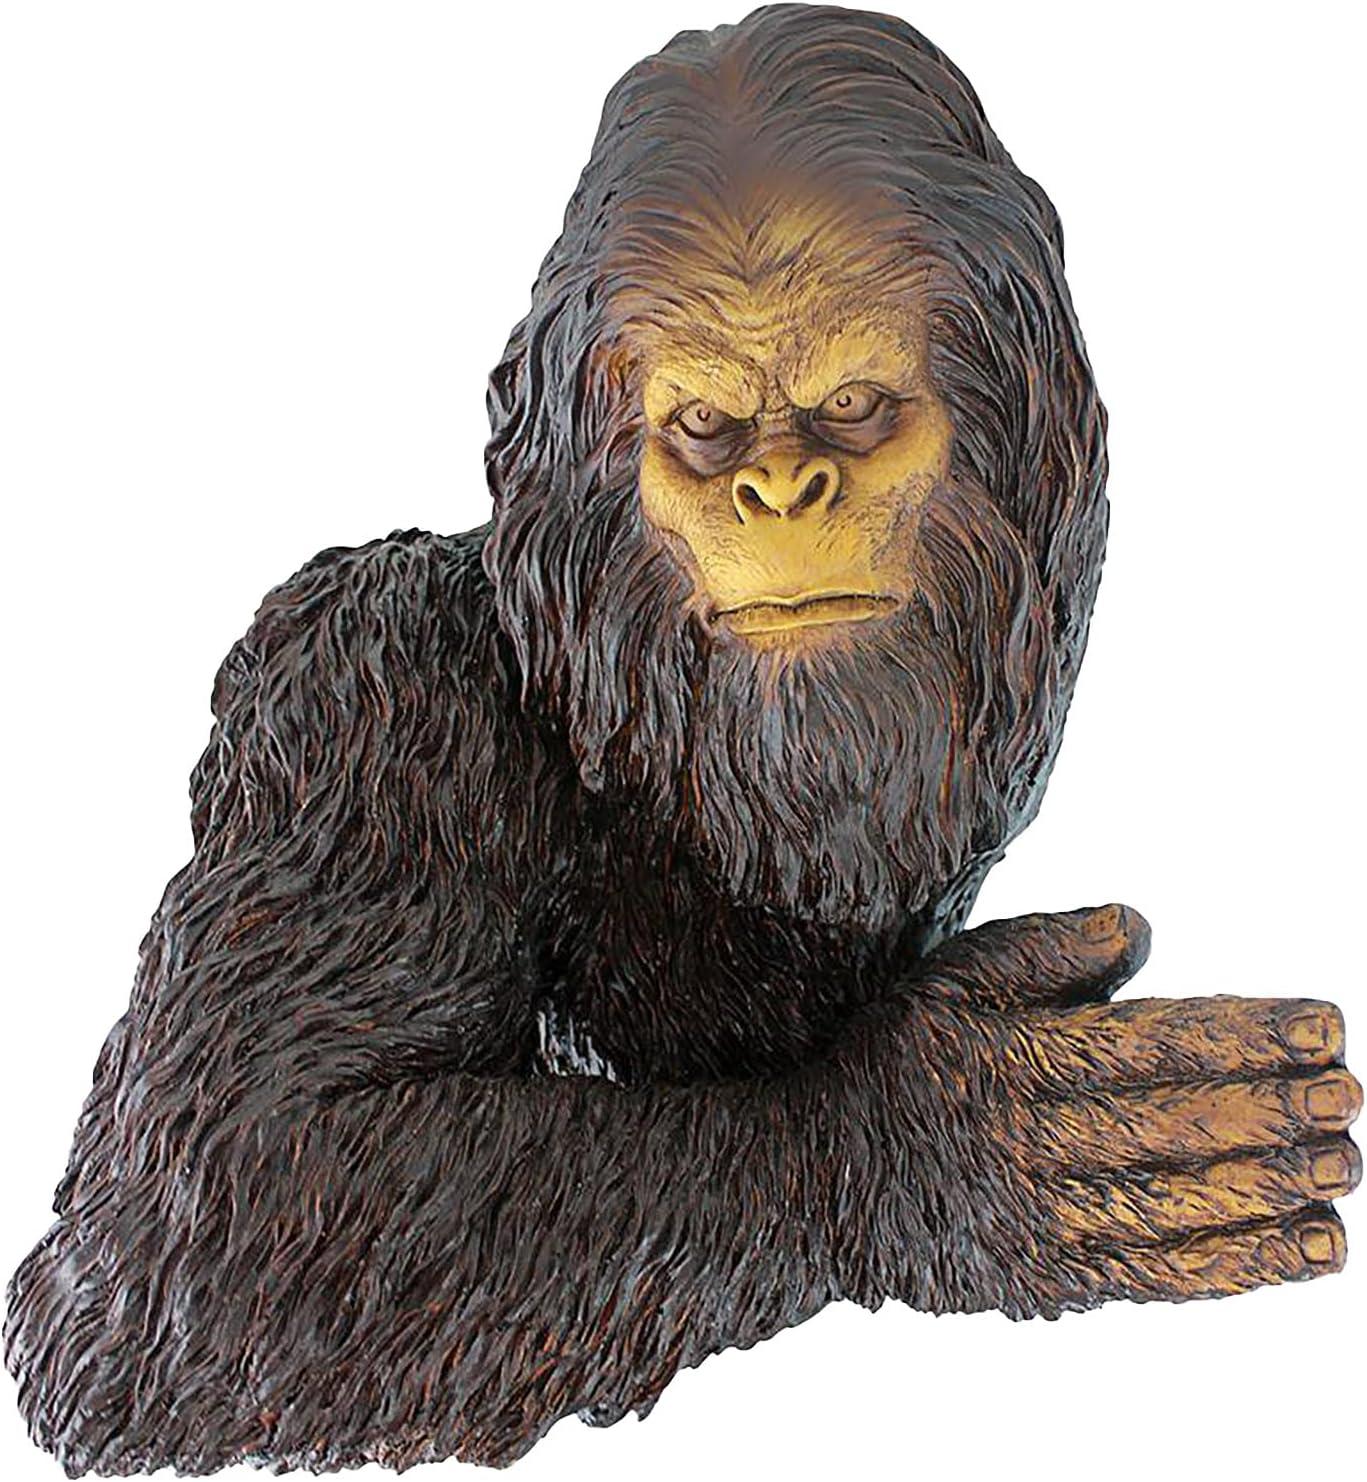 YuanYang hotpot Cheap bargain Orangutan Sculpture Resin Bigfoot B The Ornament Beauty products